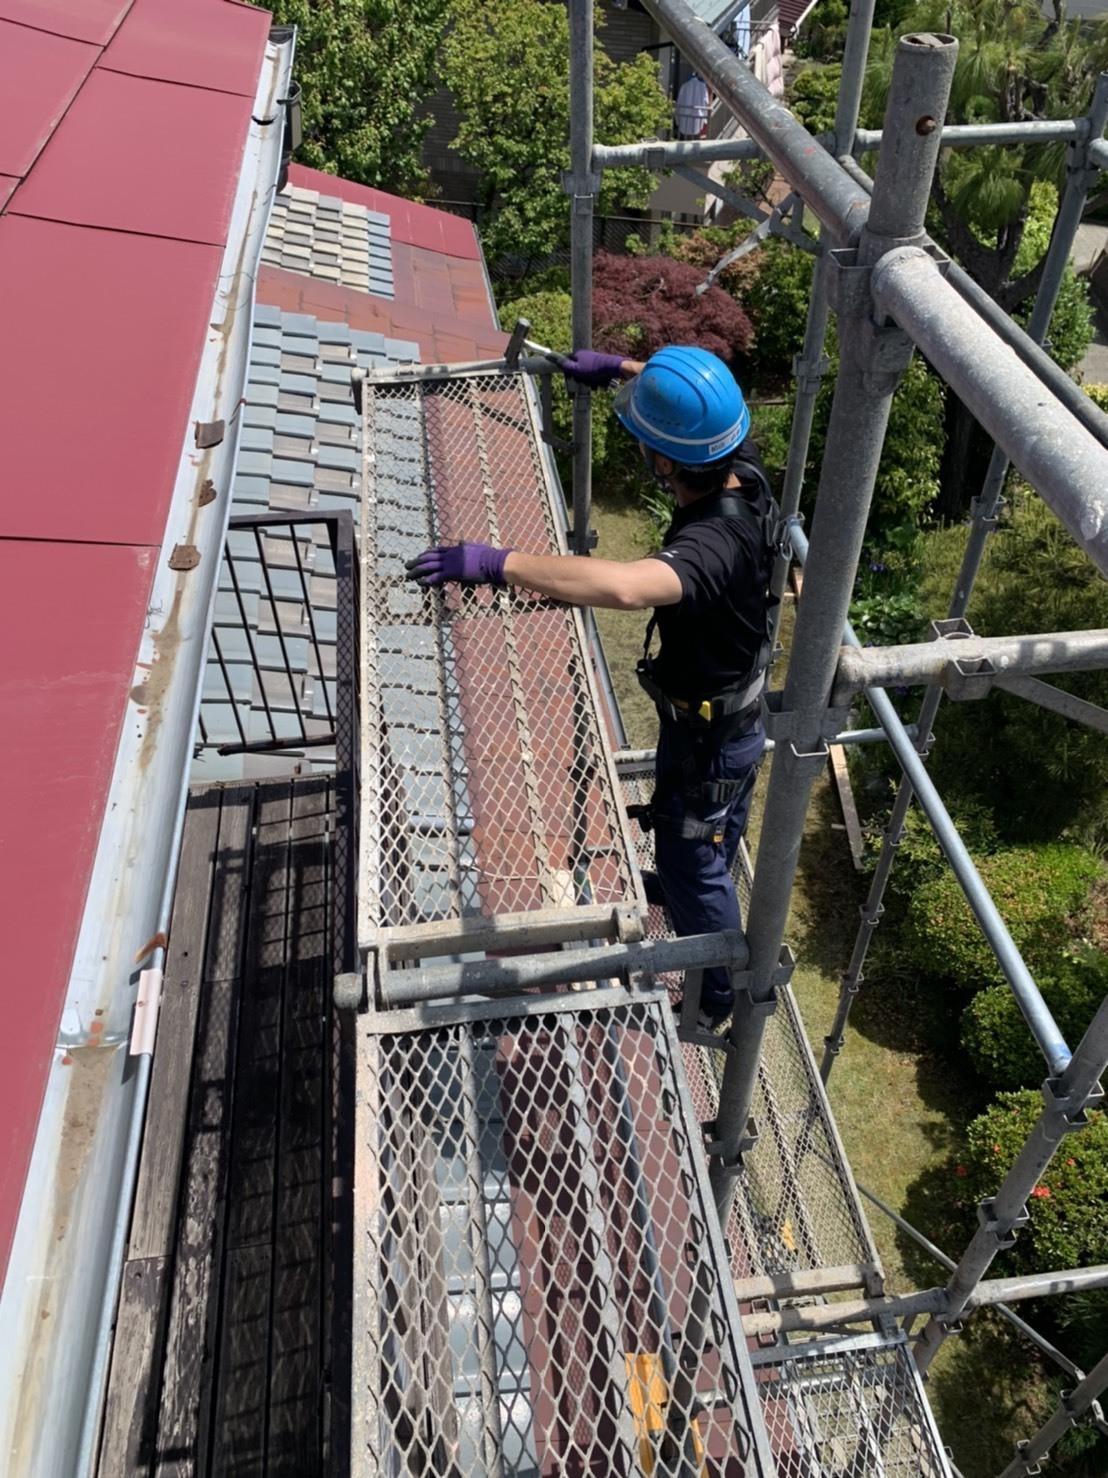 【Kanagawa】Hiring a construction worker!